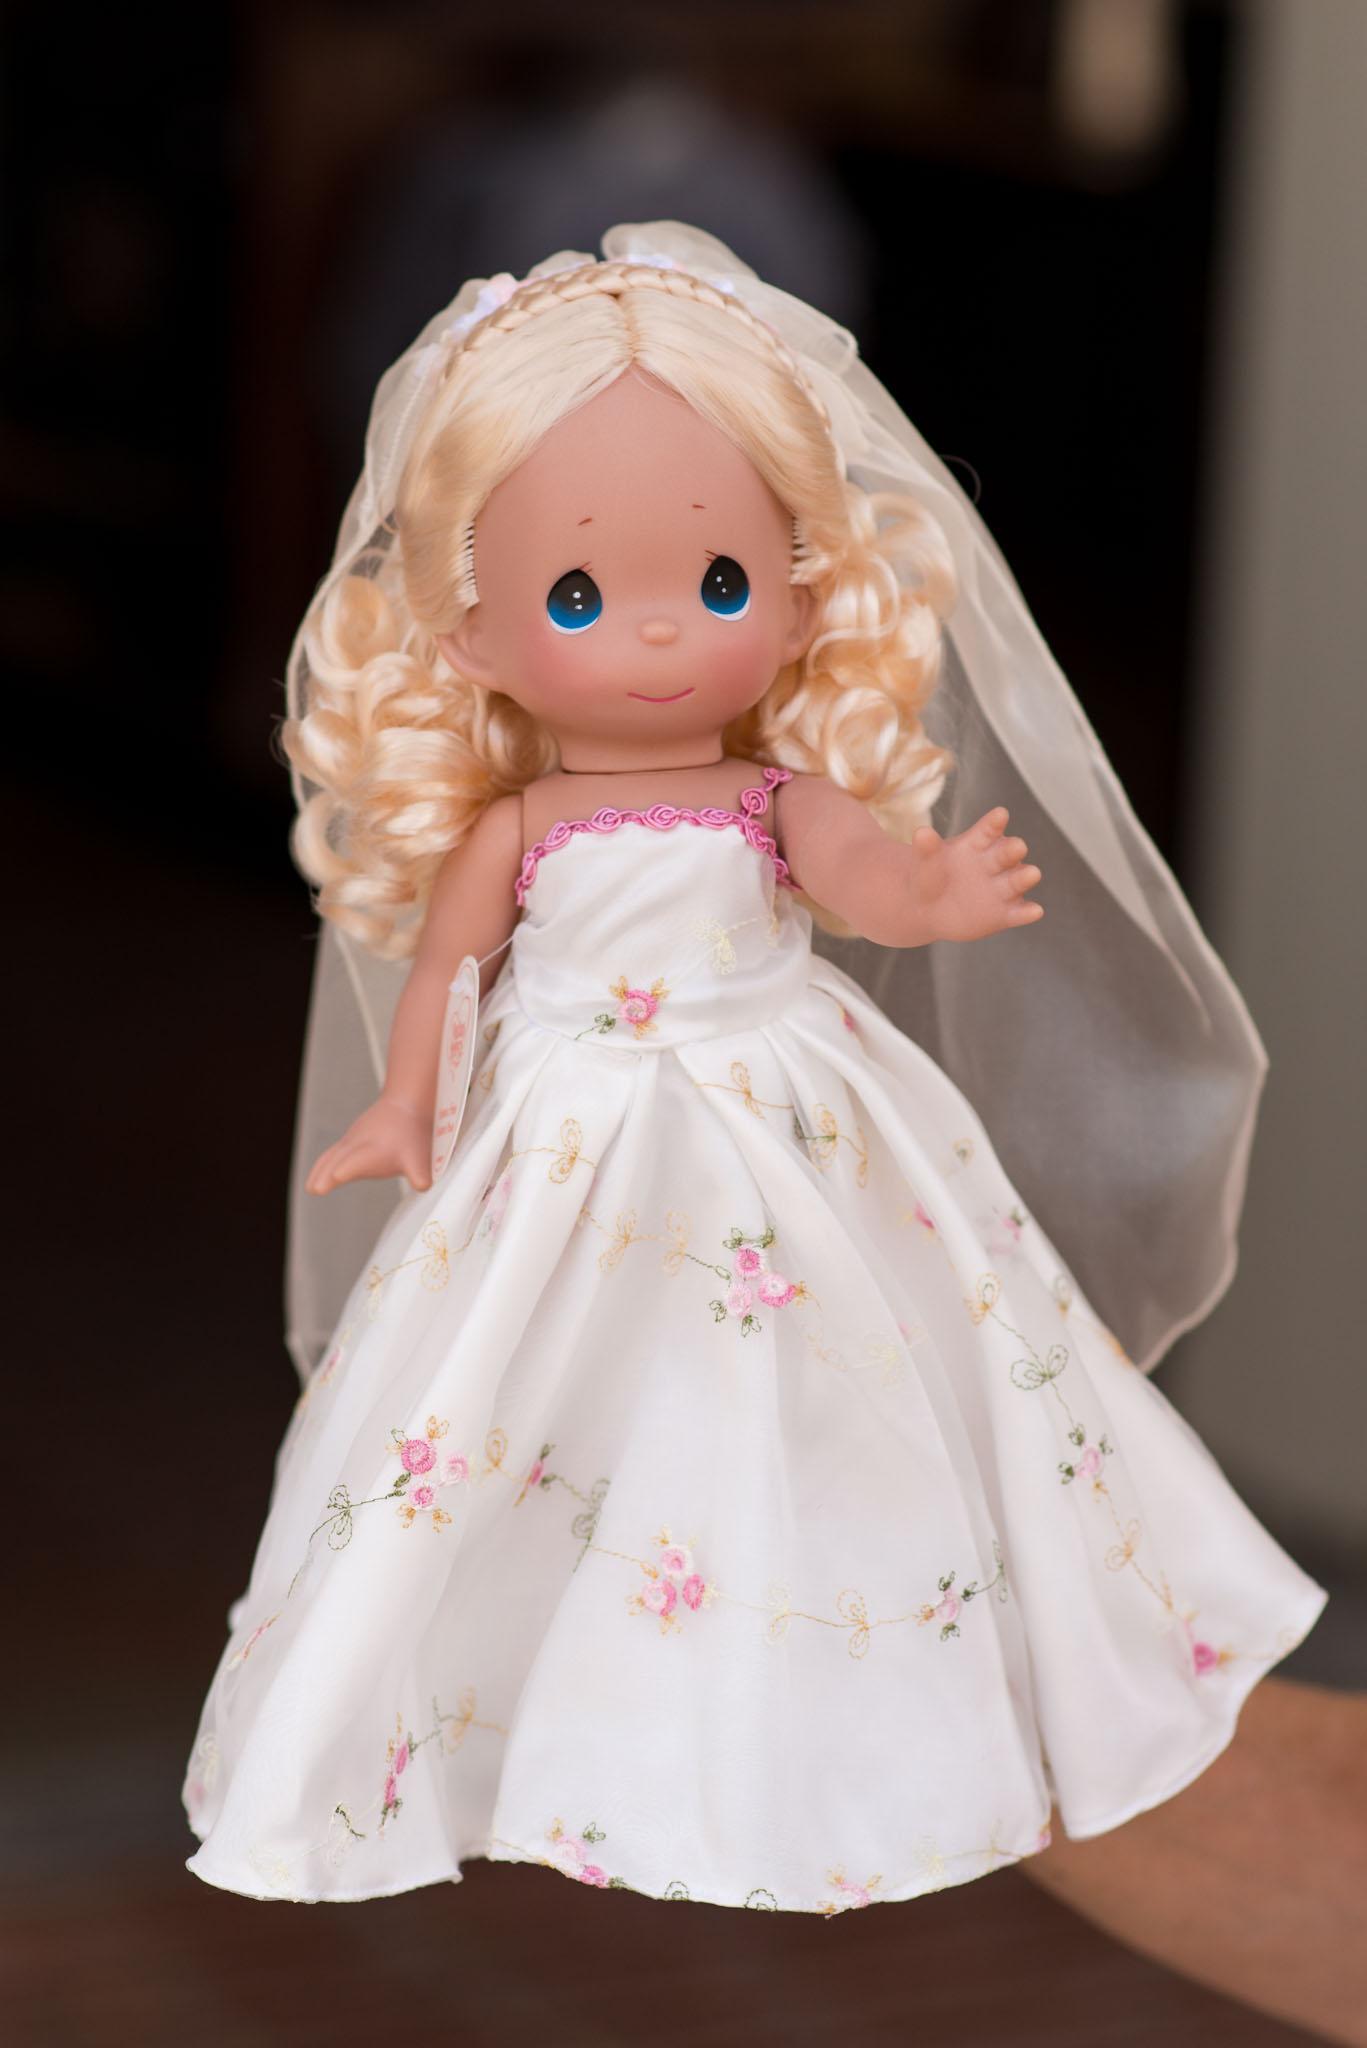 Precious Moments Disney Doll Collection - Cinderella in Bridal Dress - Epcot Flower & Garden Festival 2016